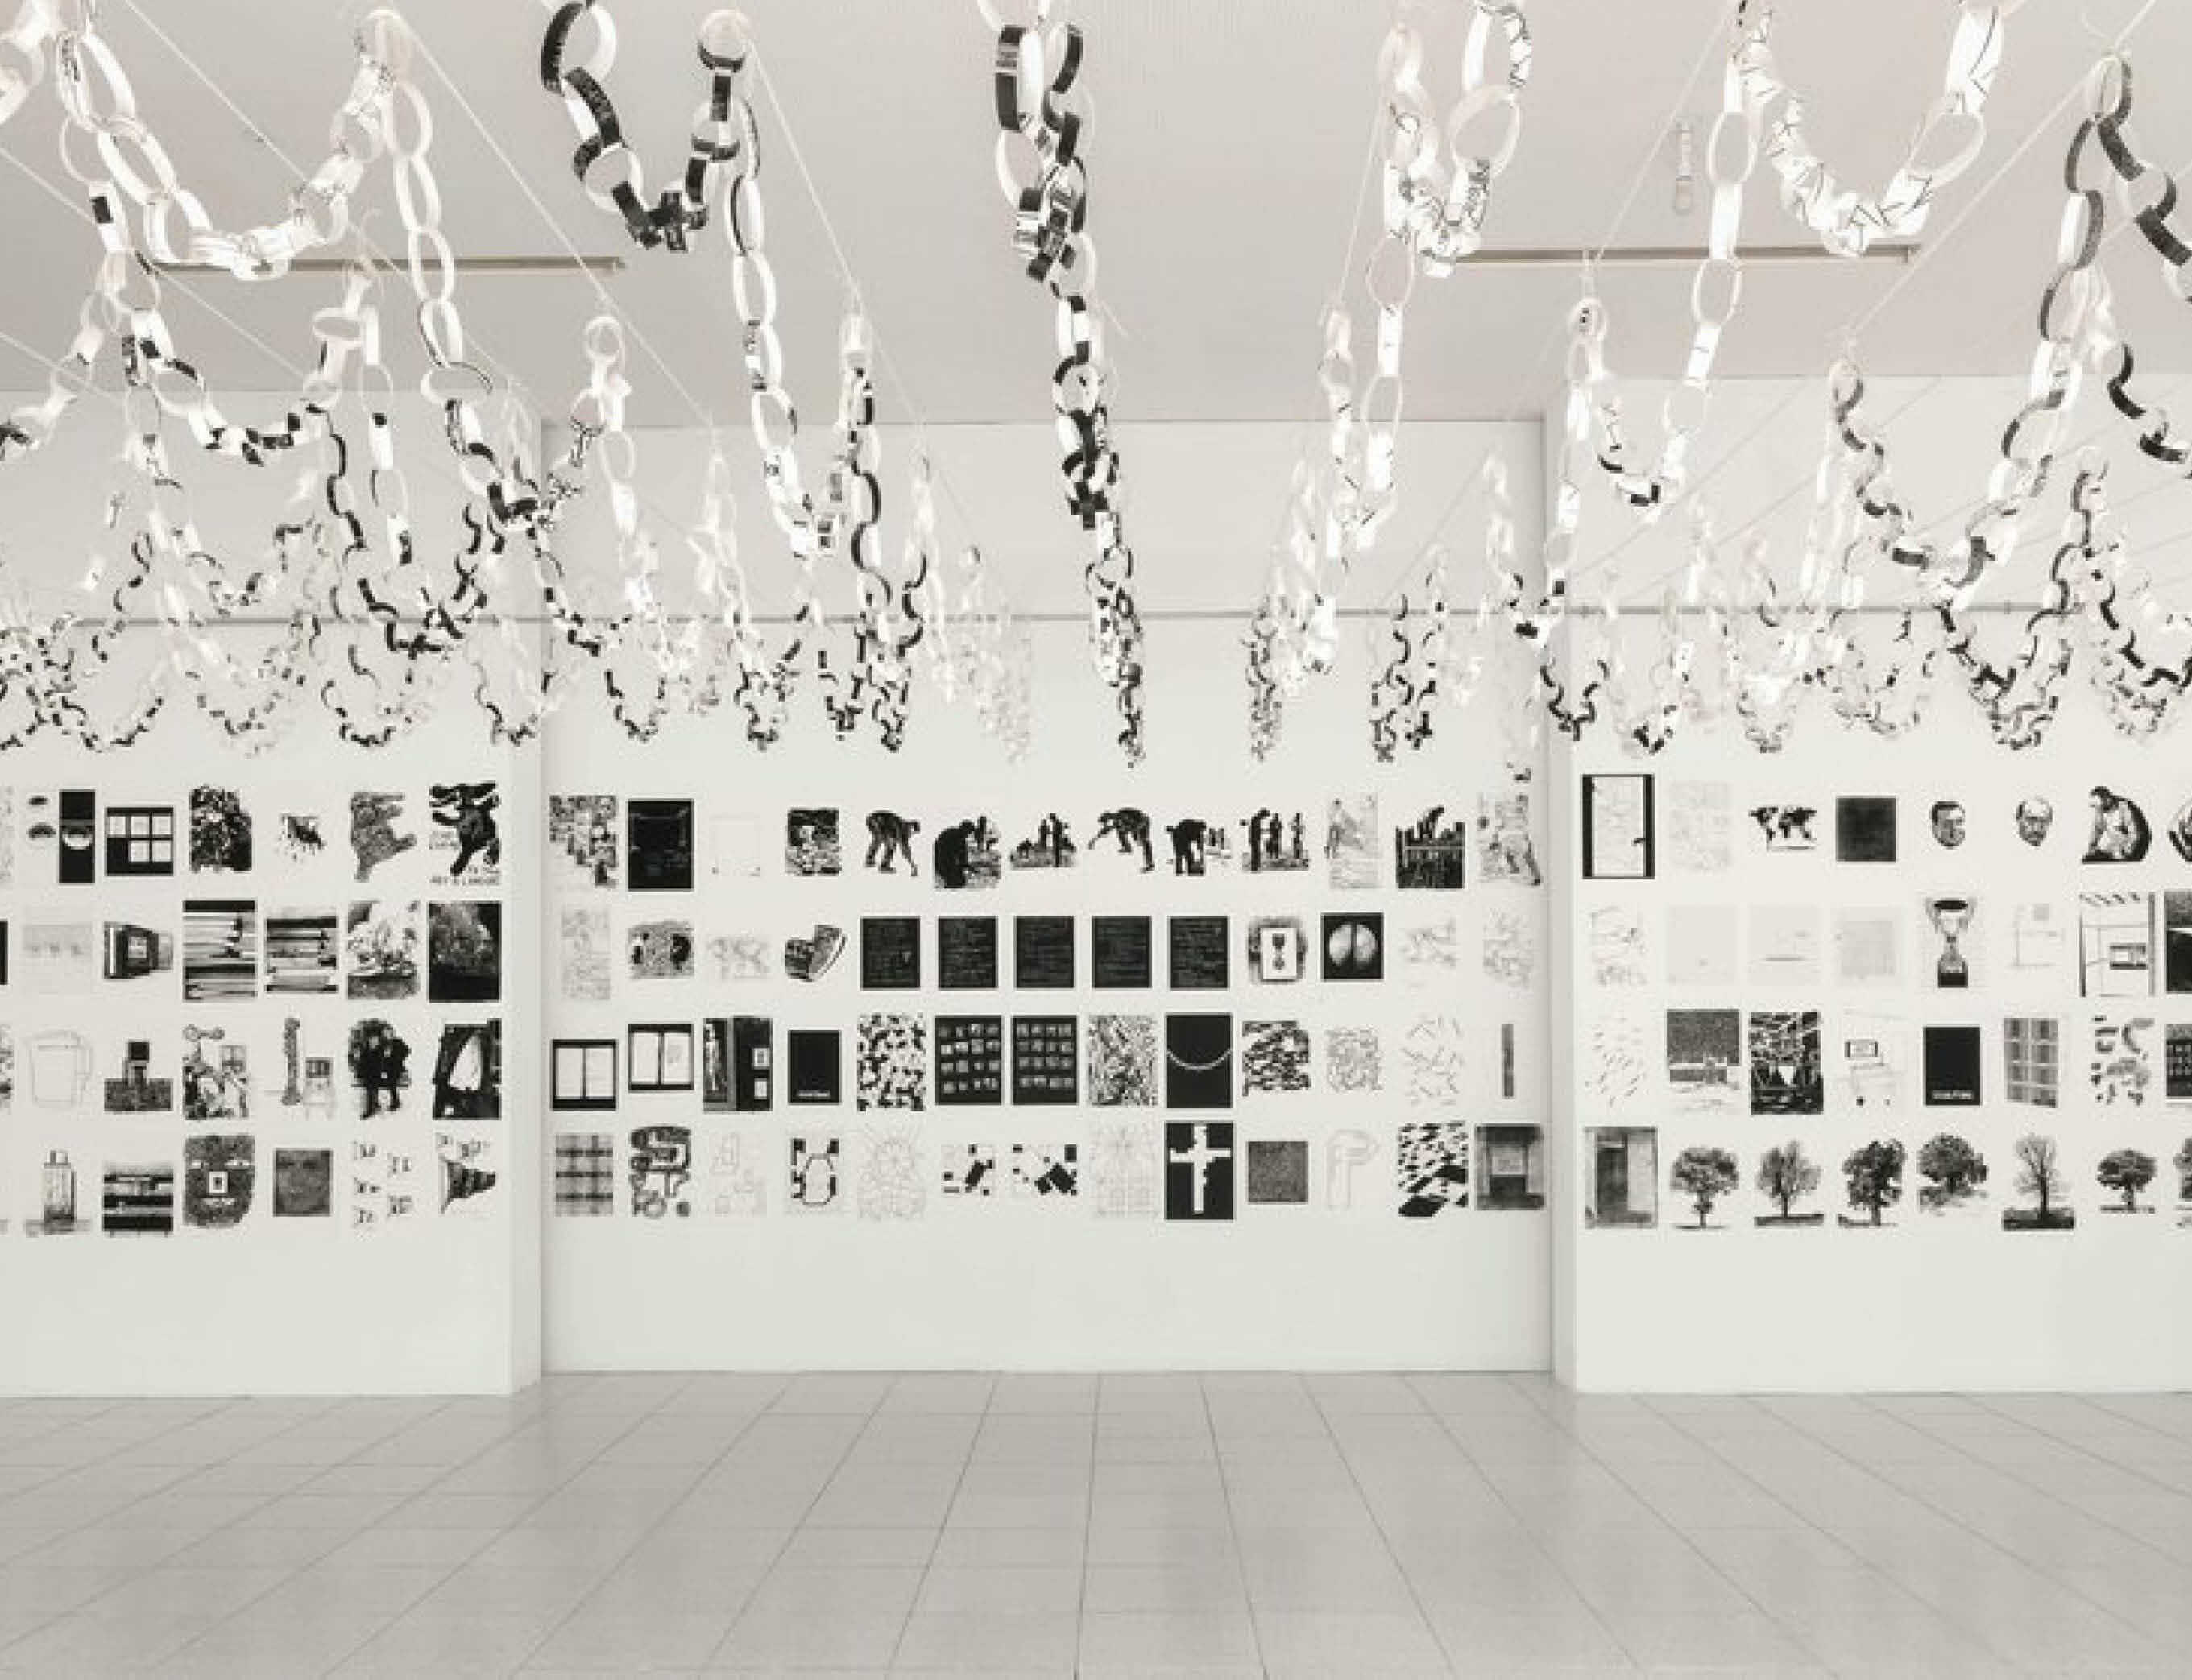 Art & Language present 'Nobody Spoke' at Kunstaele, Berlin, Germany